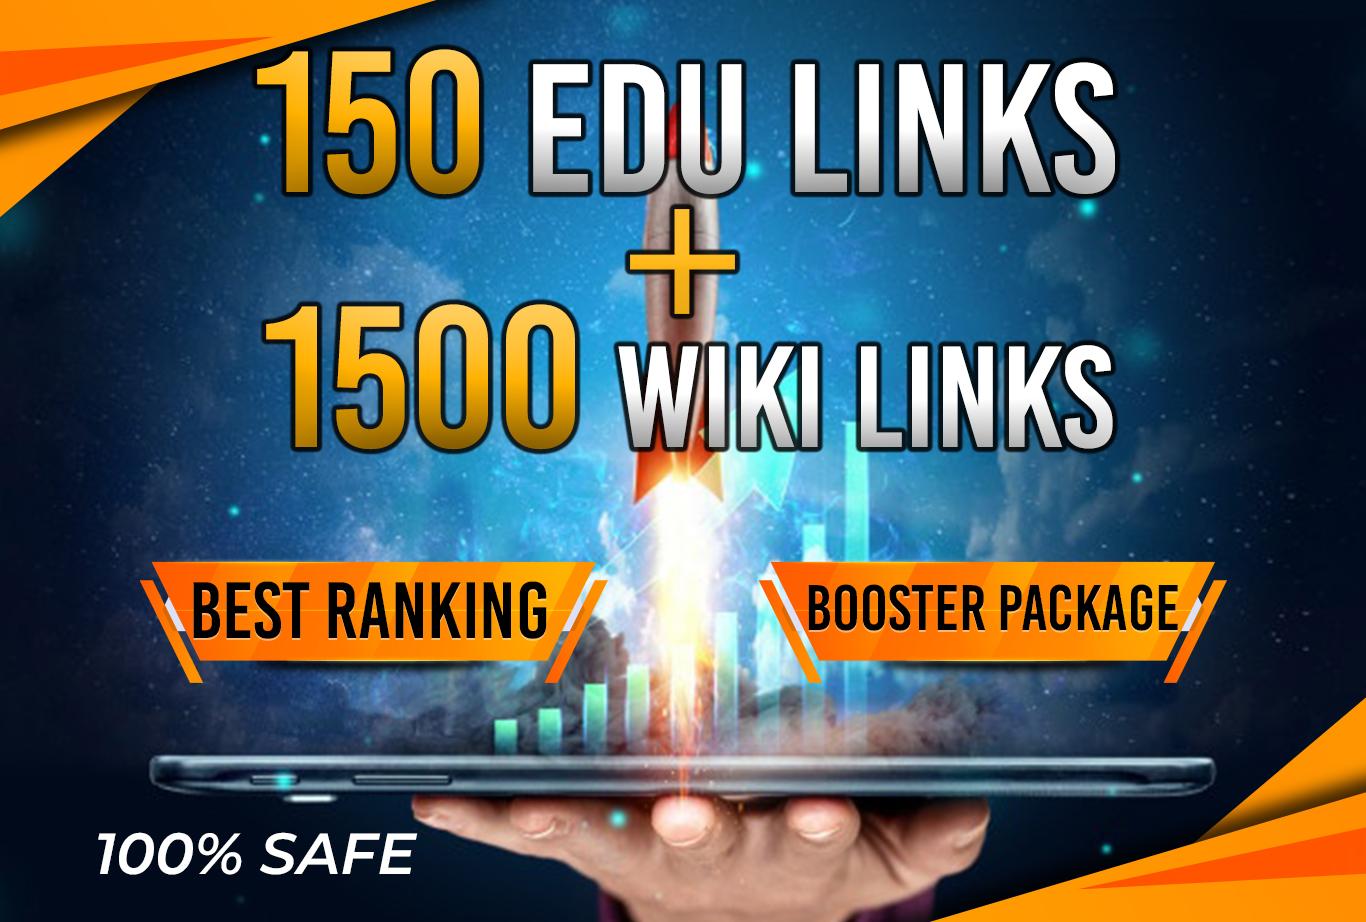 Trusted 150 EDU + 1500 WIKI link Best Ranking Package